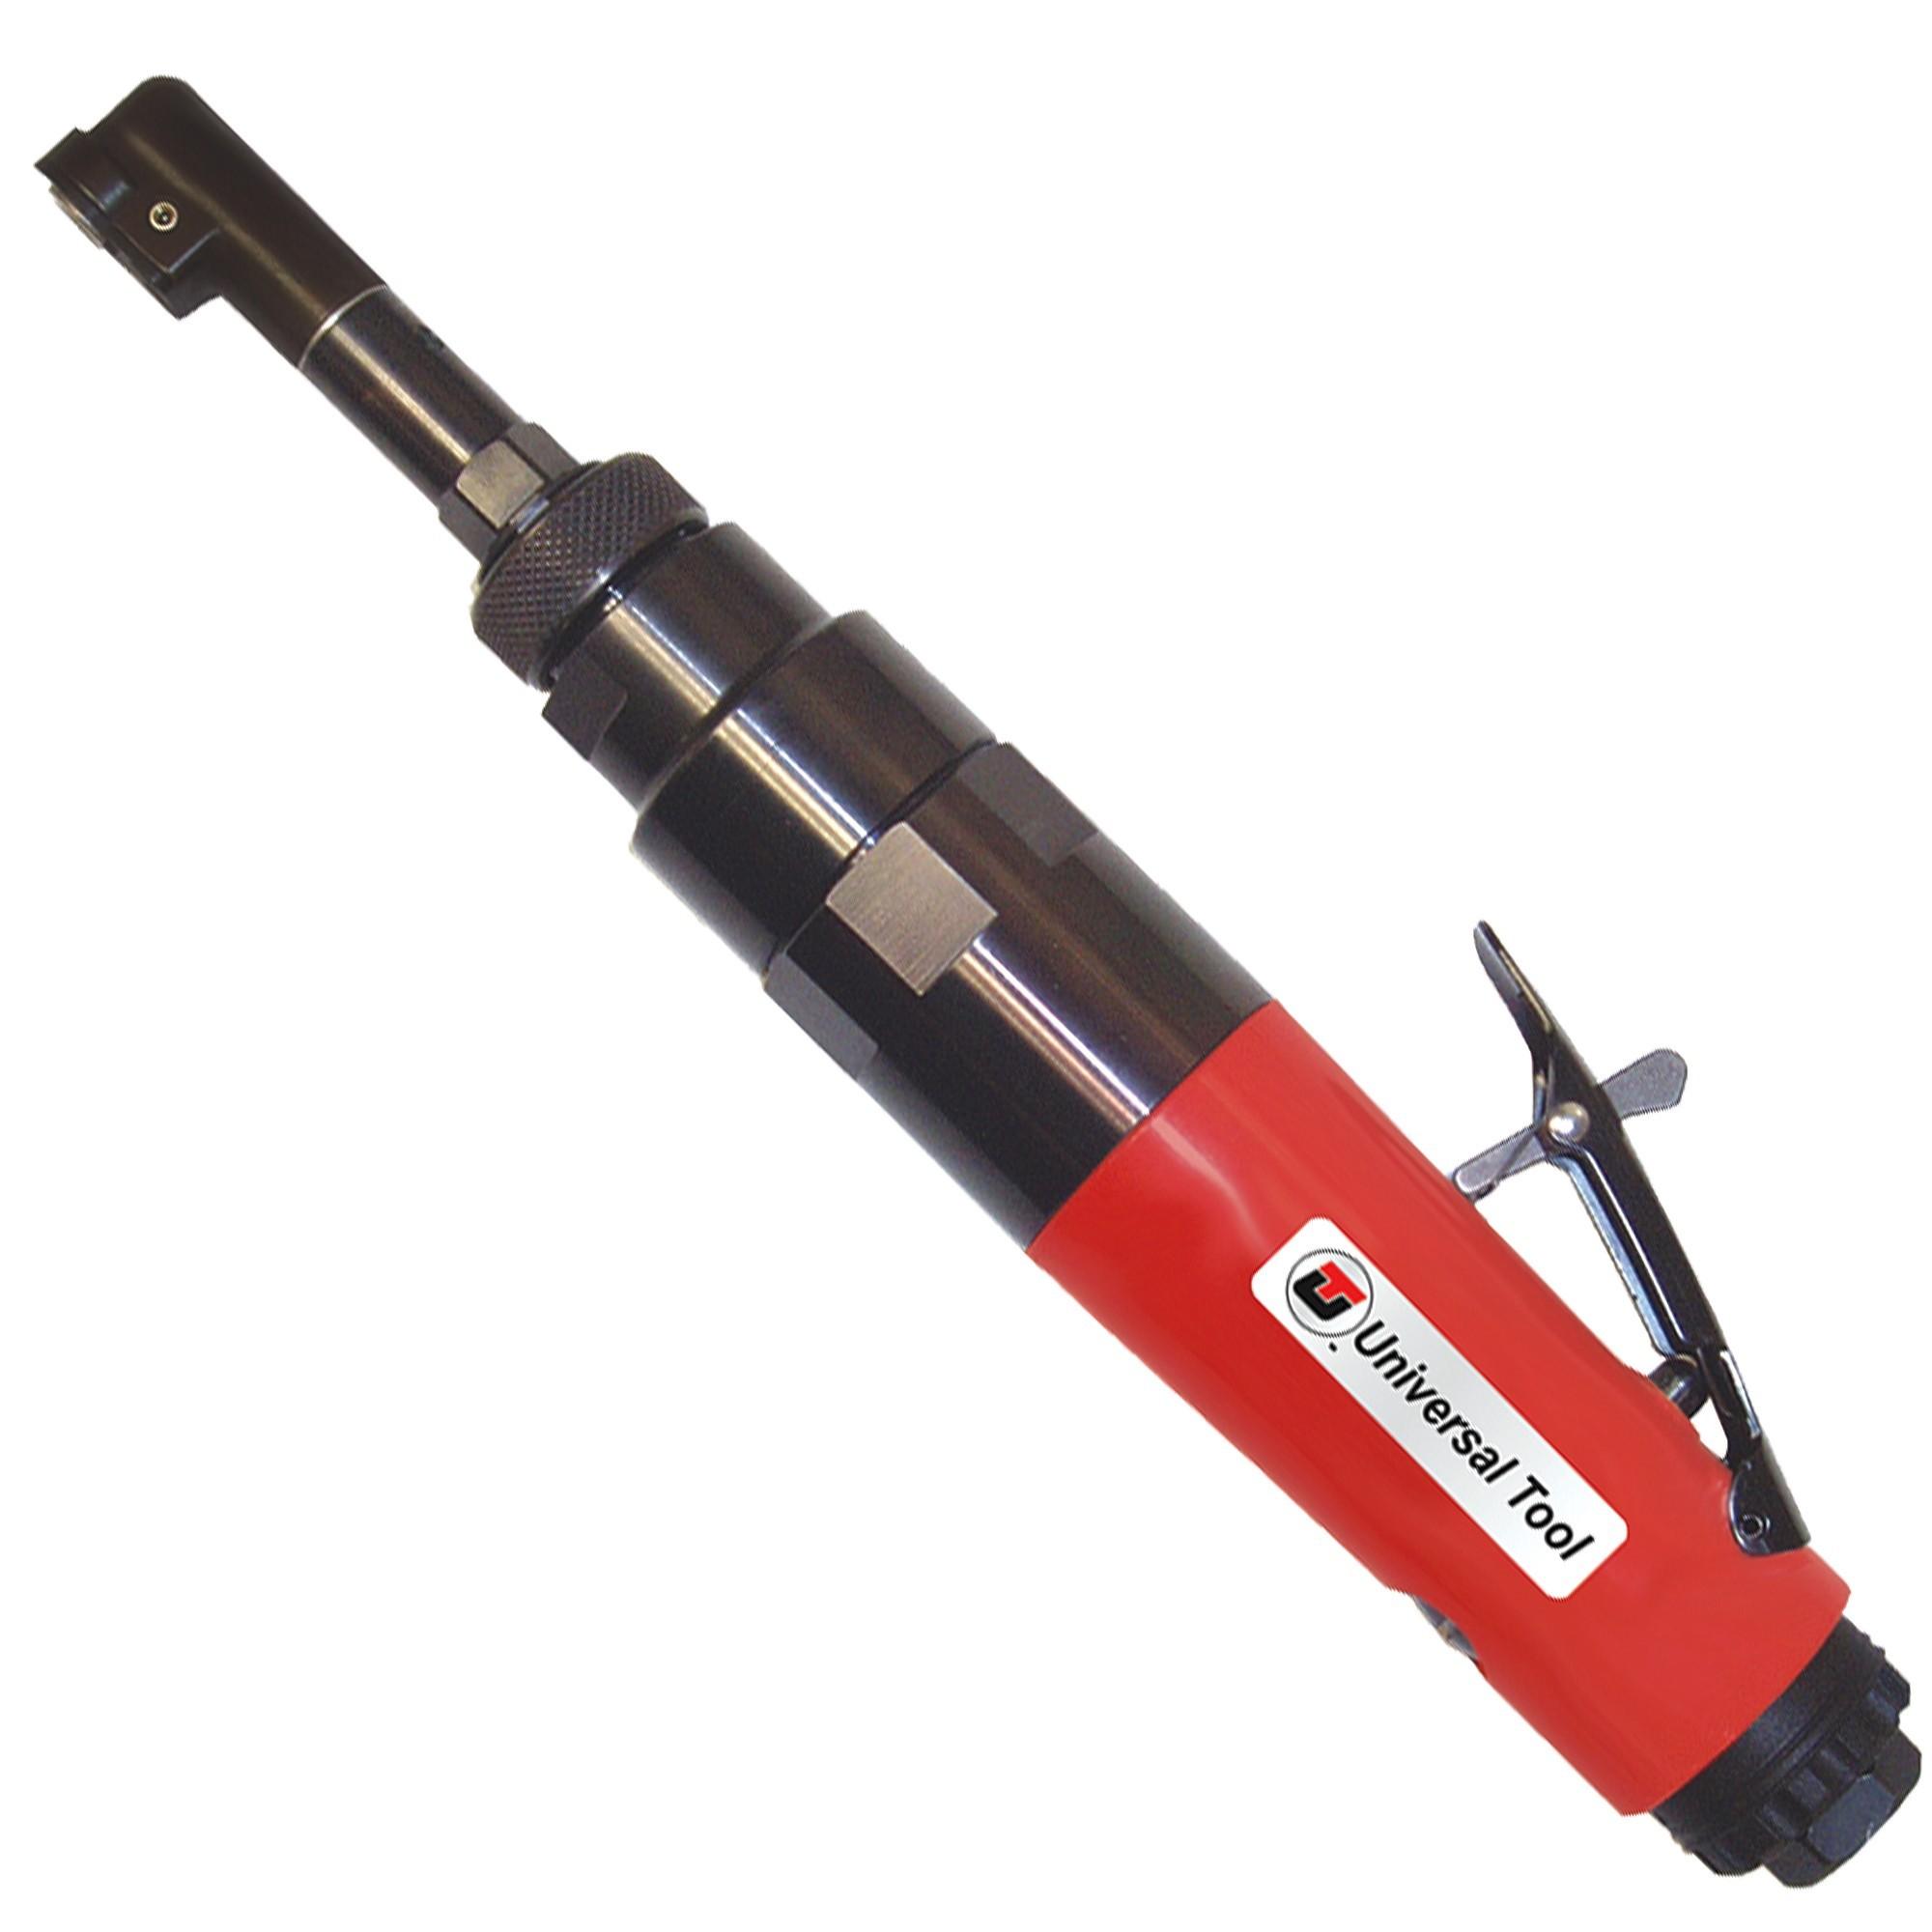 Aircraft Drill Motor W/O Angle Head 6000 RPM